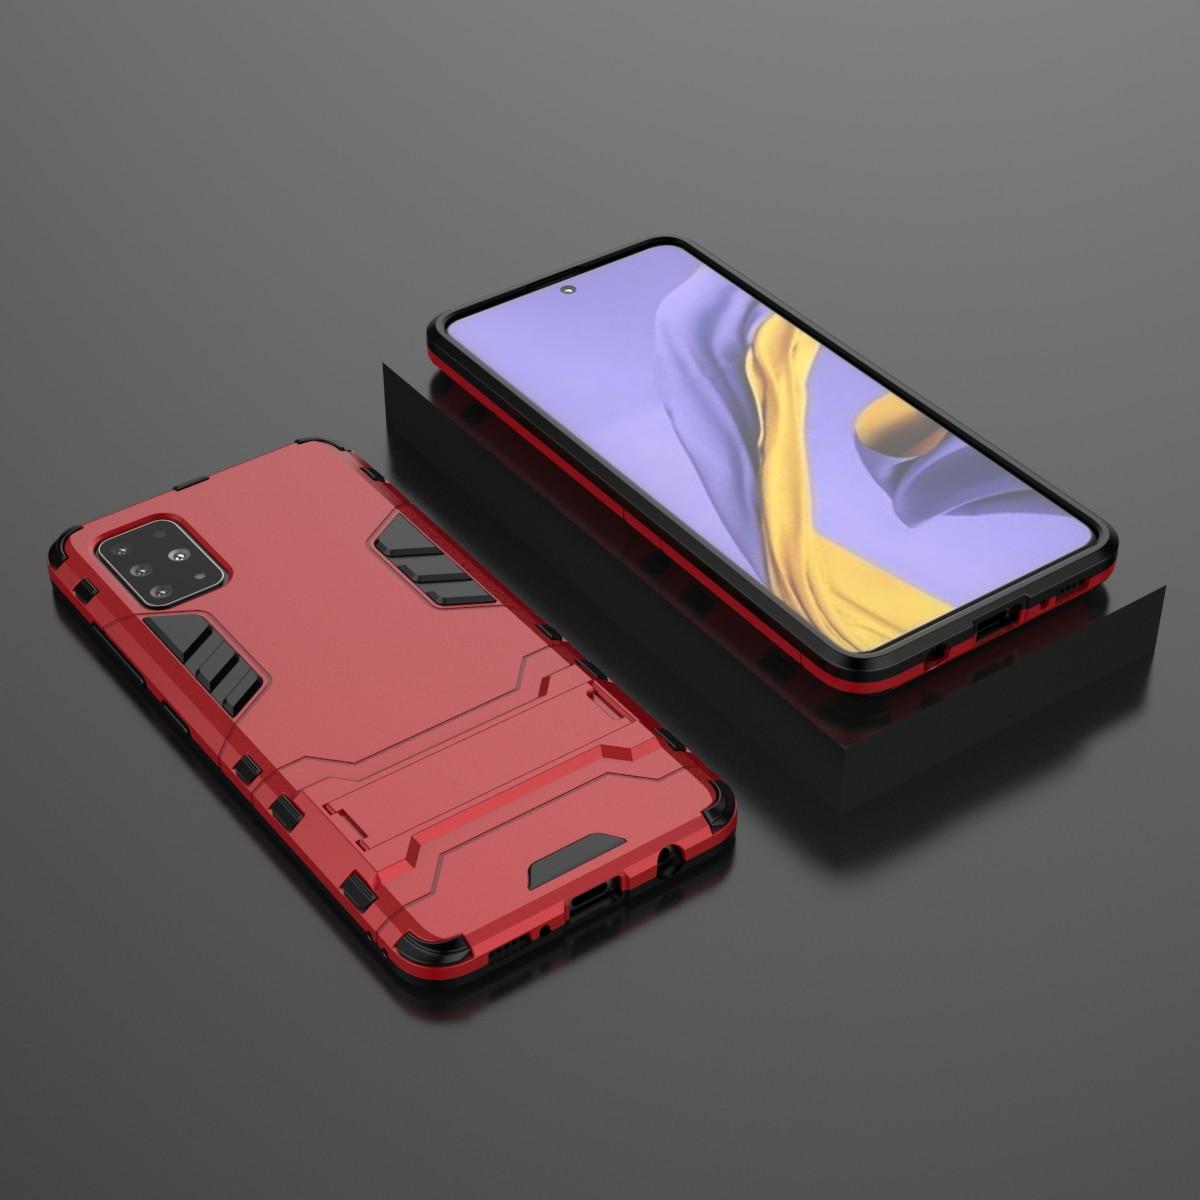 Shockproof Case For Samsung Galaxy A71 A51 A41 A31 A10 A30 A70 A60 A40 A80 A90 5G 2019 Cover For Samsung A 51 71 2020 Cases